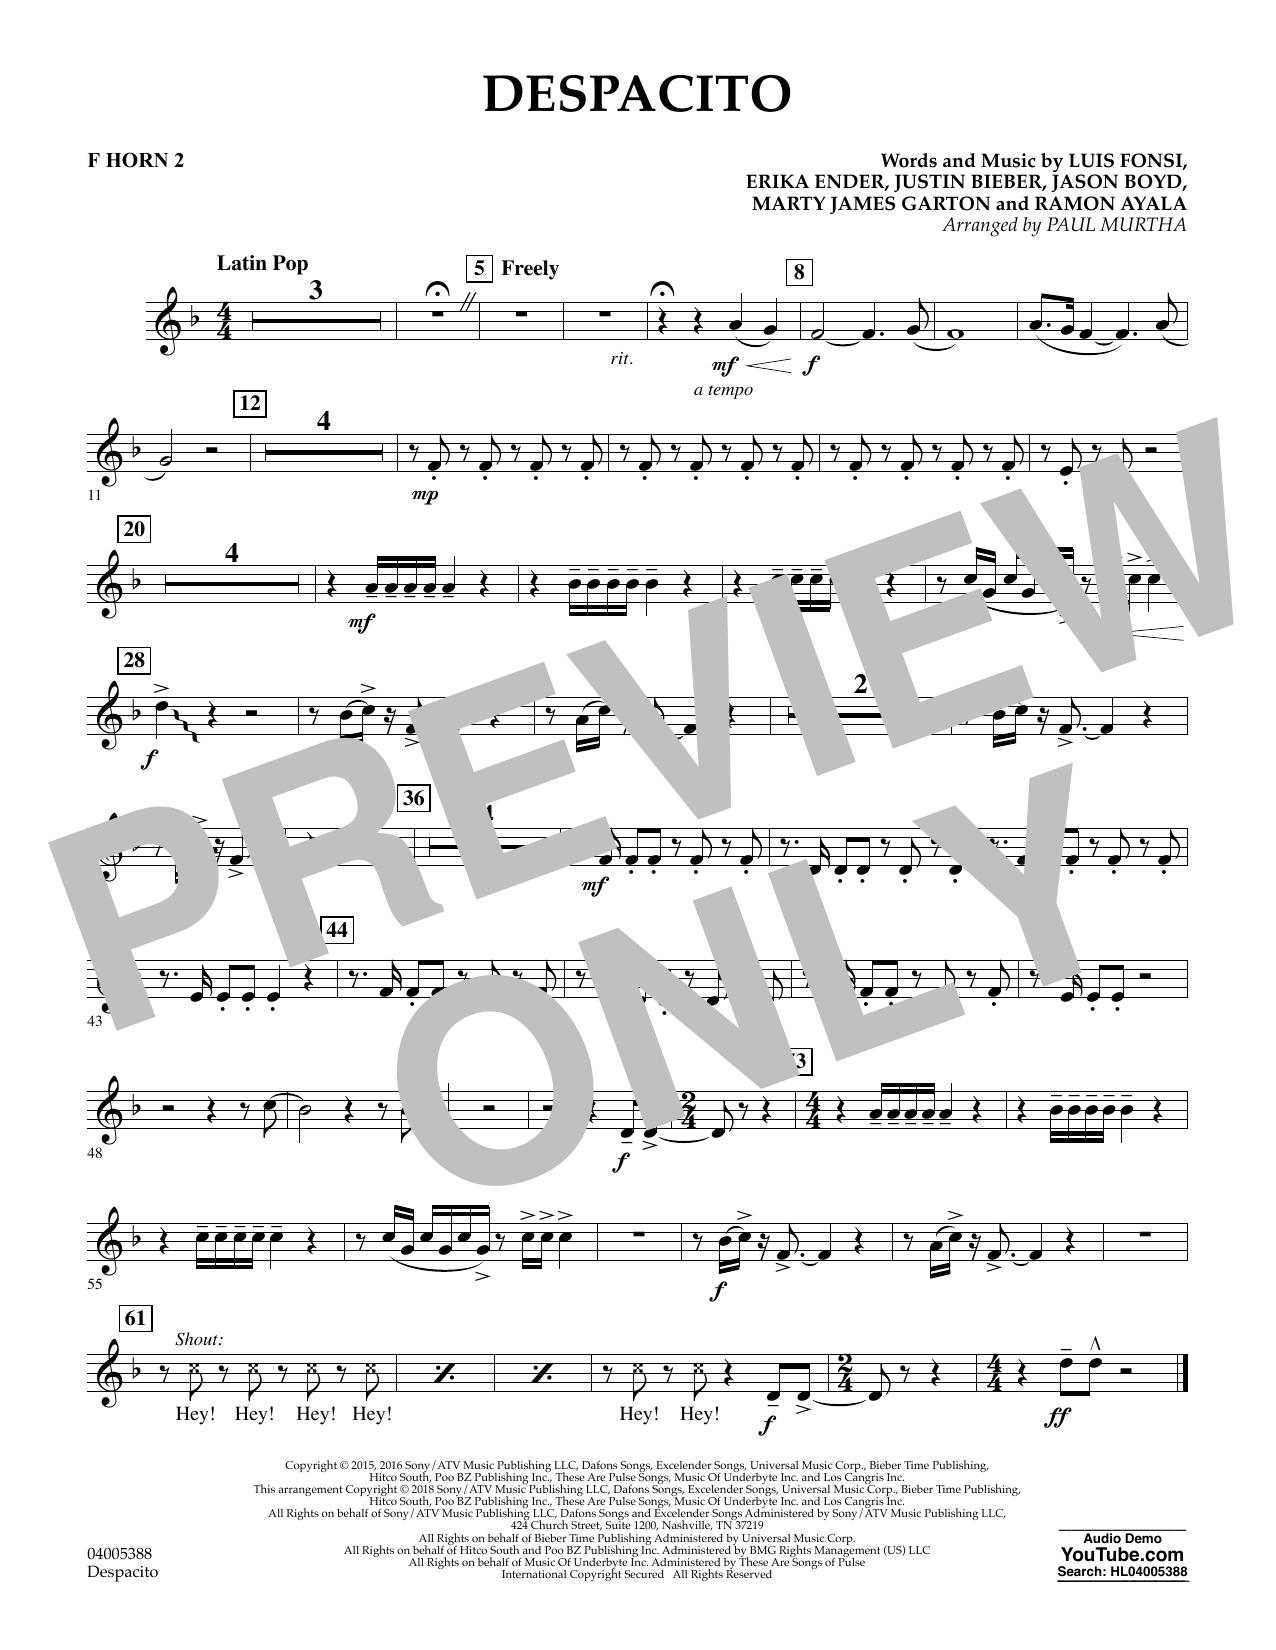 Despacito (arr. Paul Murtha) - F Horn 2 (Concert Band)